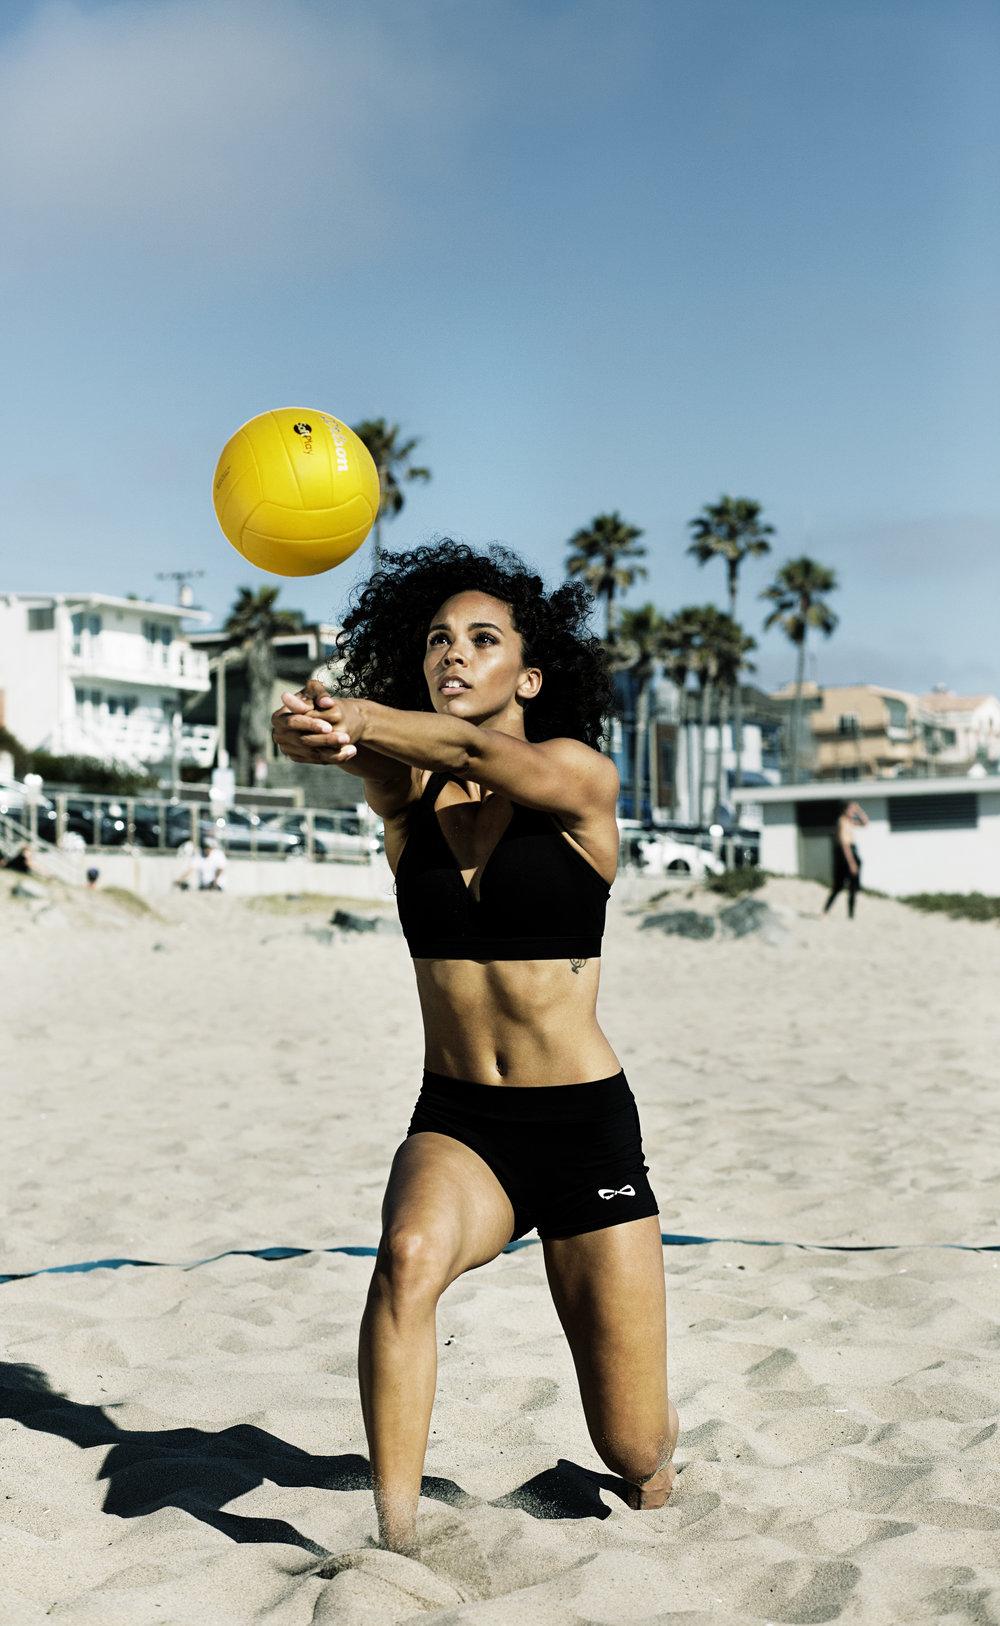 Katrina_Focus_Volleyball_02.jpg